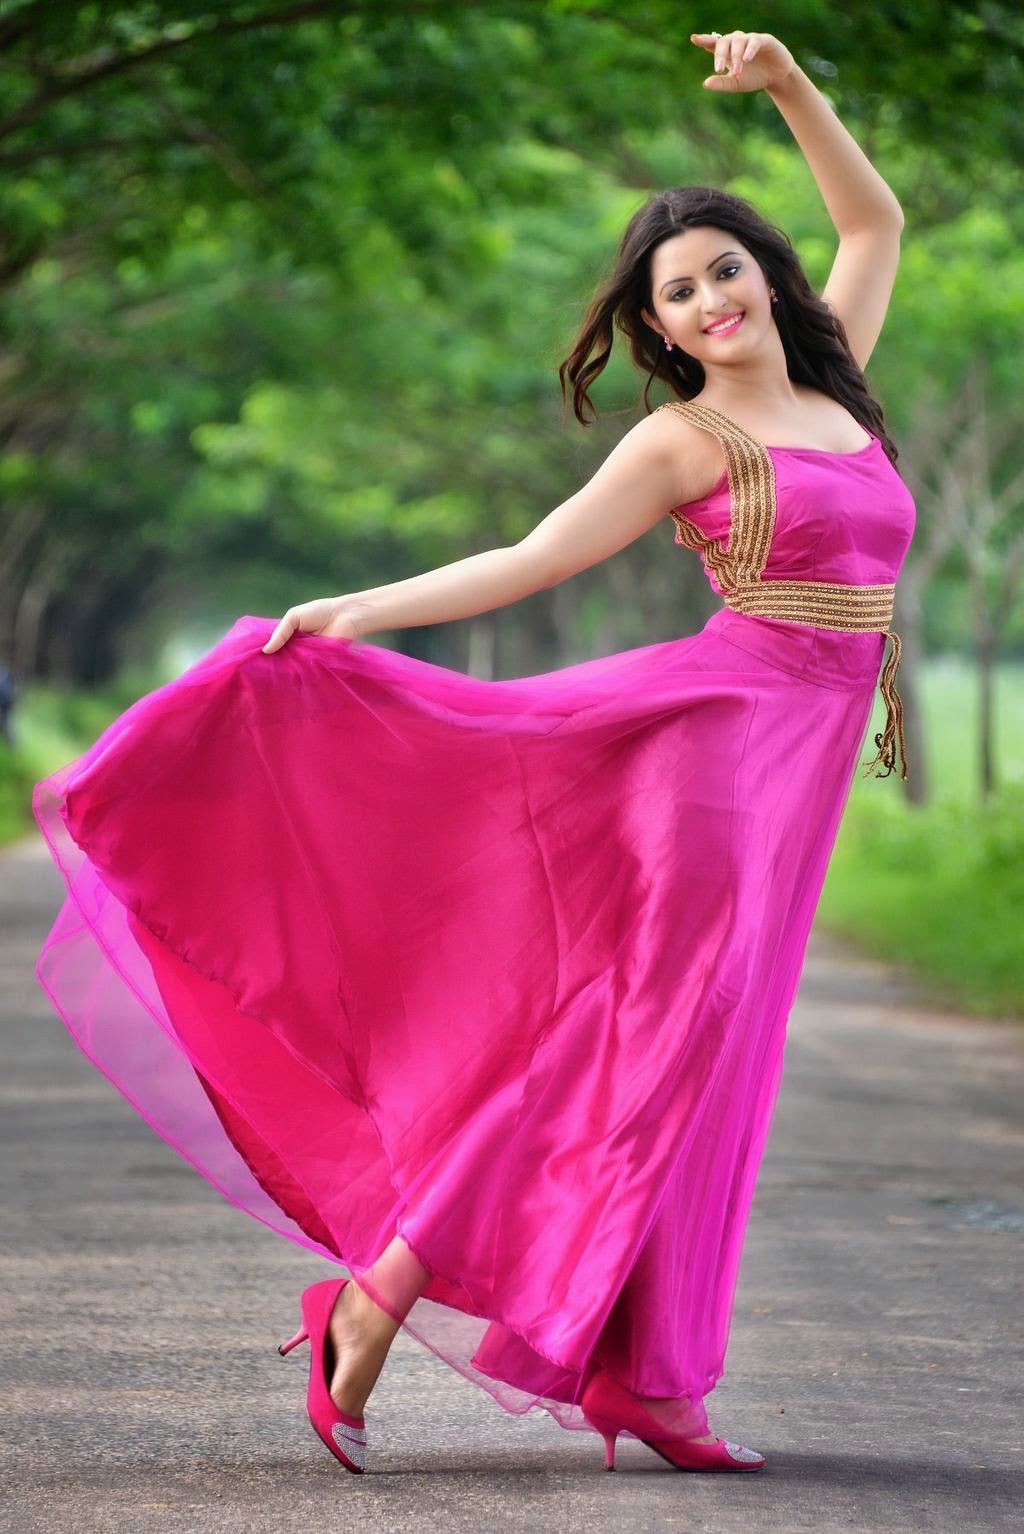 Bangladeshi Hot Sexy Video